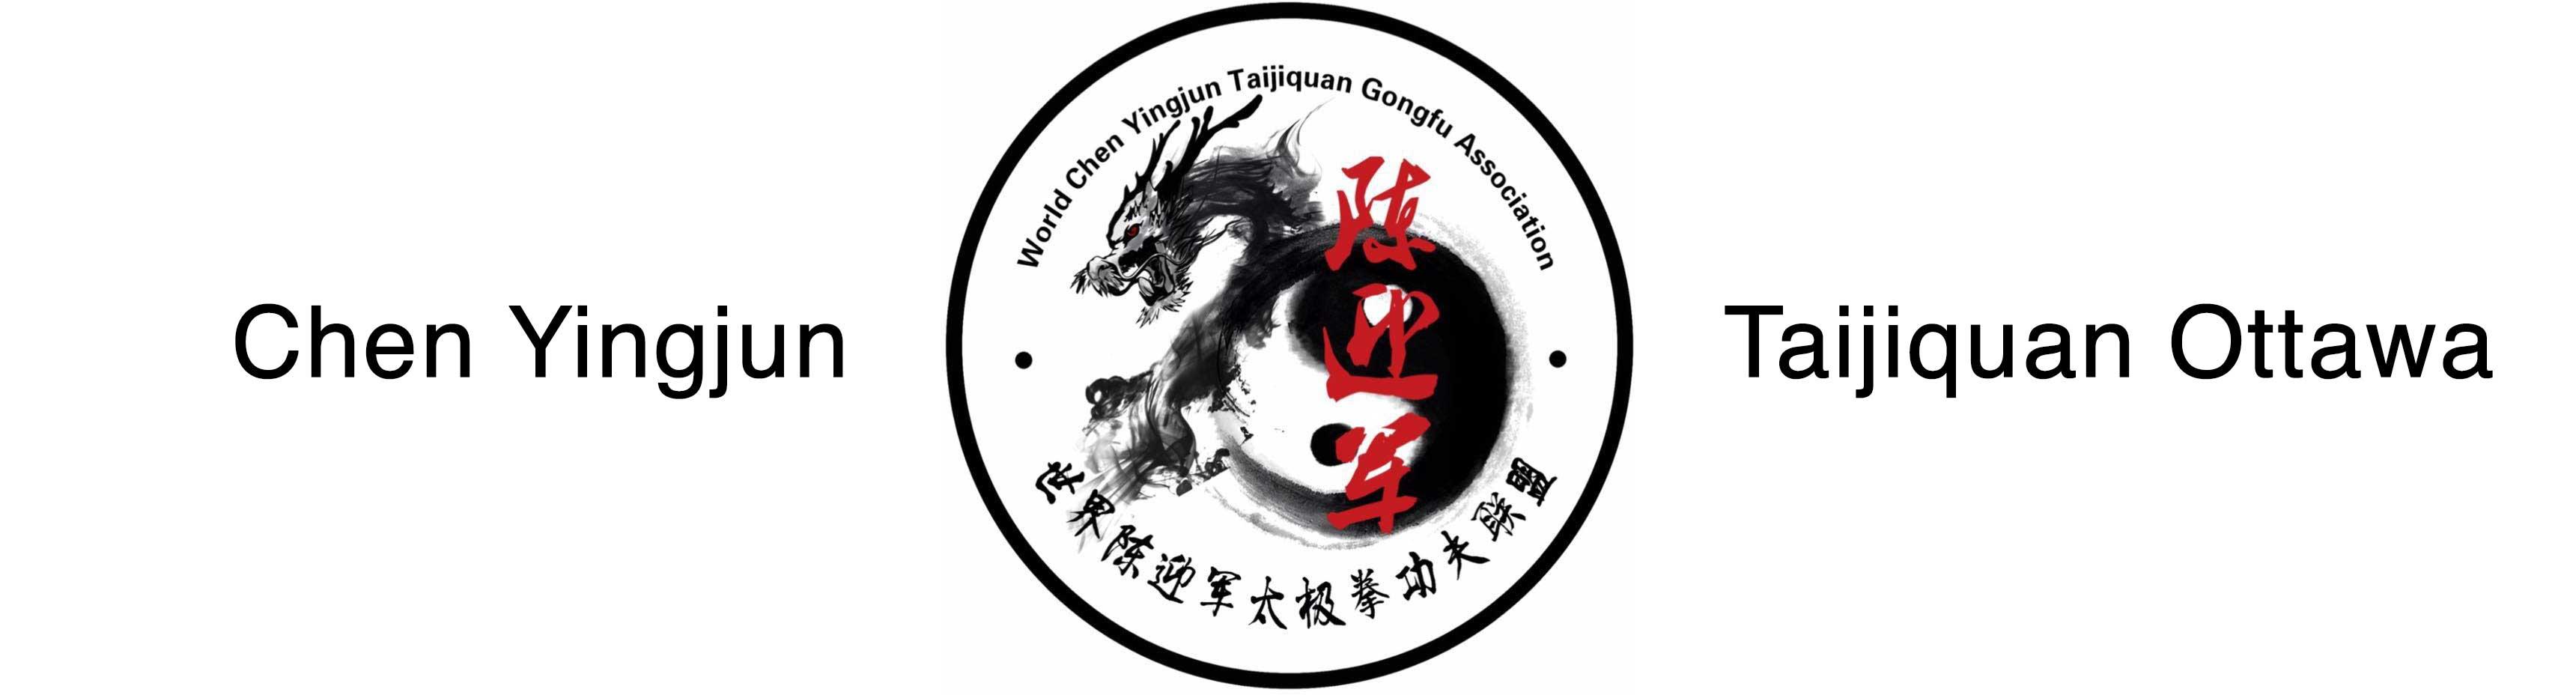 Chen Yingjun Tai Chi Ottawa